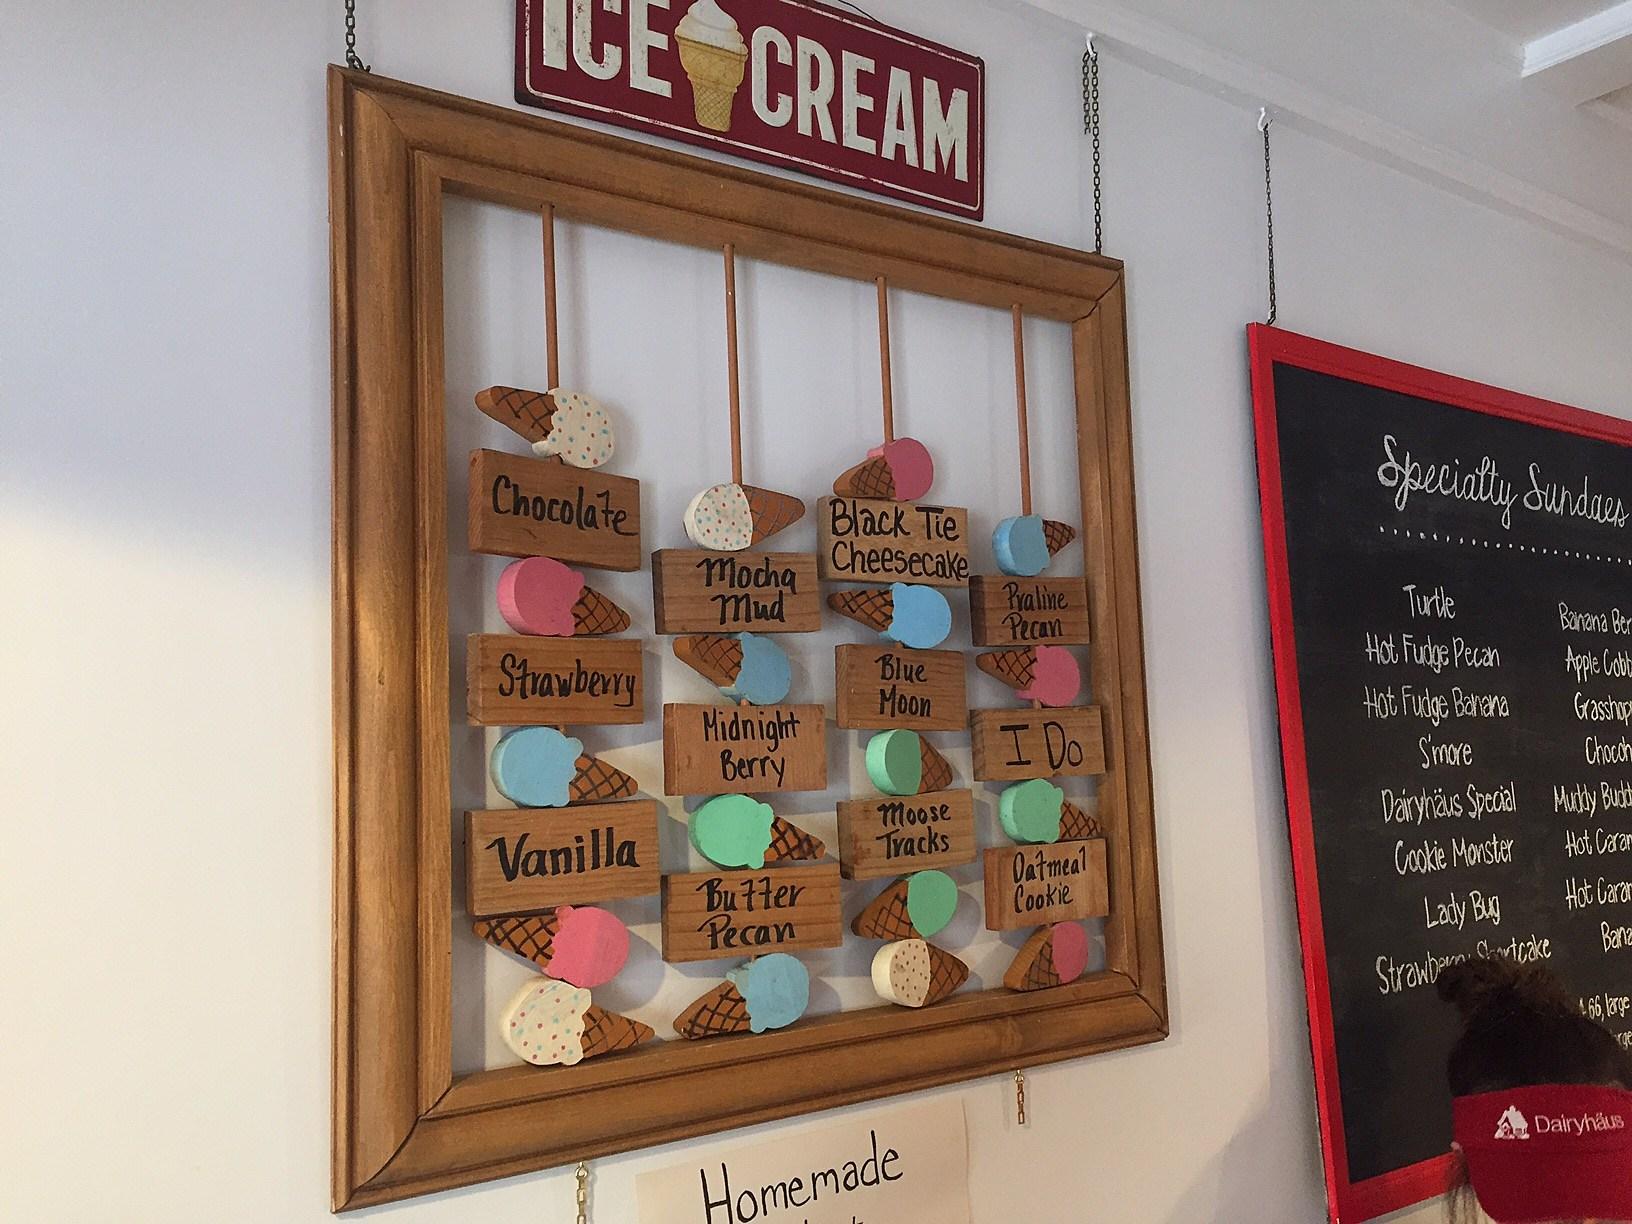 The 10 Commandments of Dairyhaus